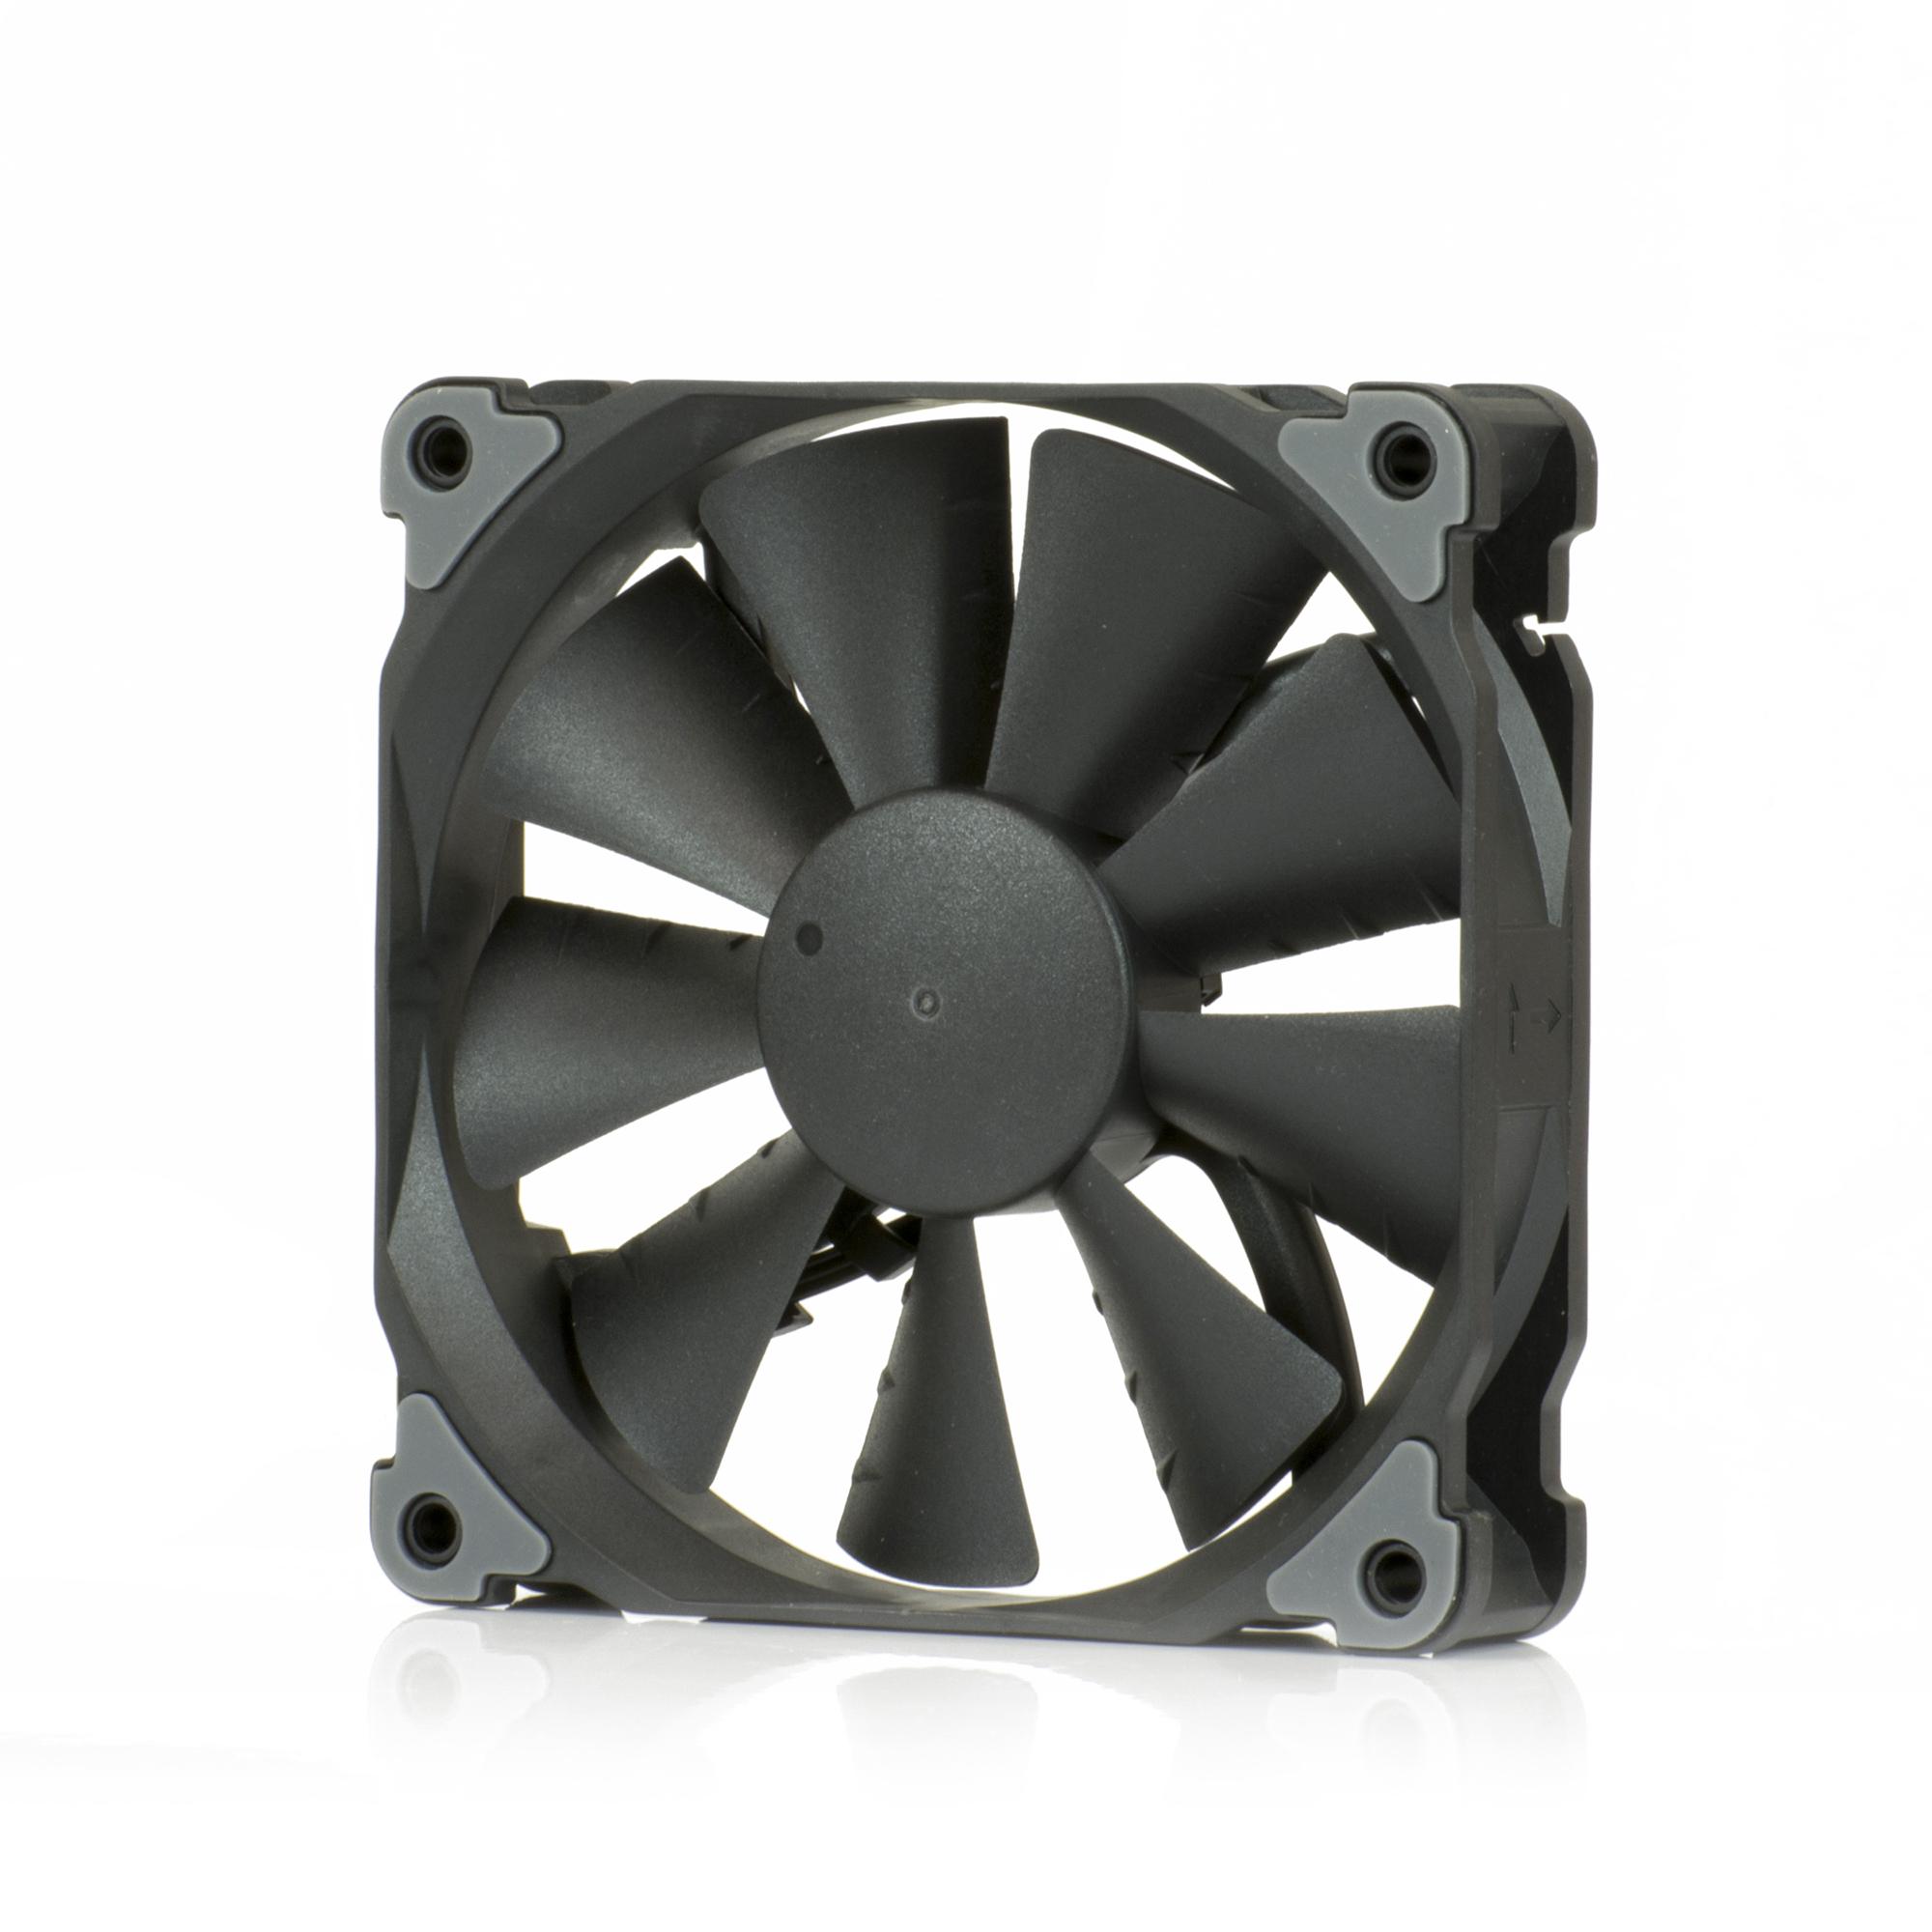 hight resolution of ph f120sp case fan